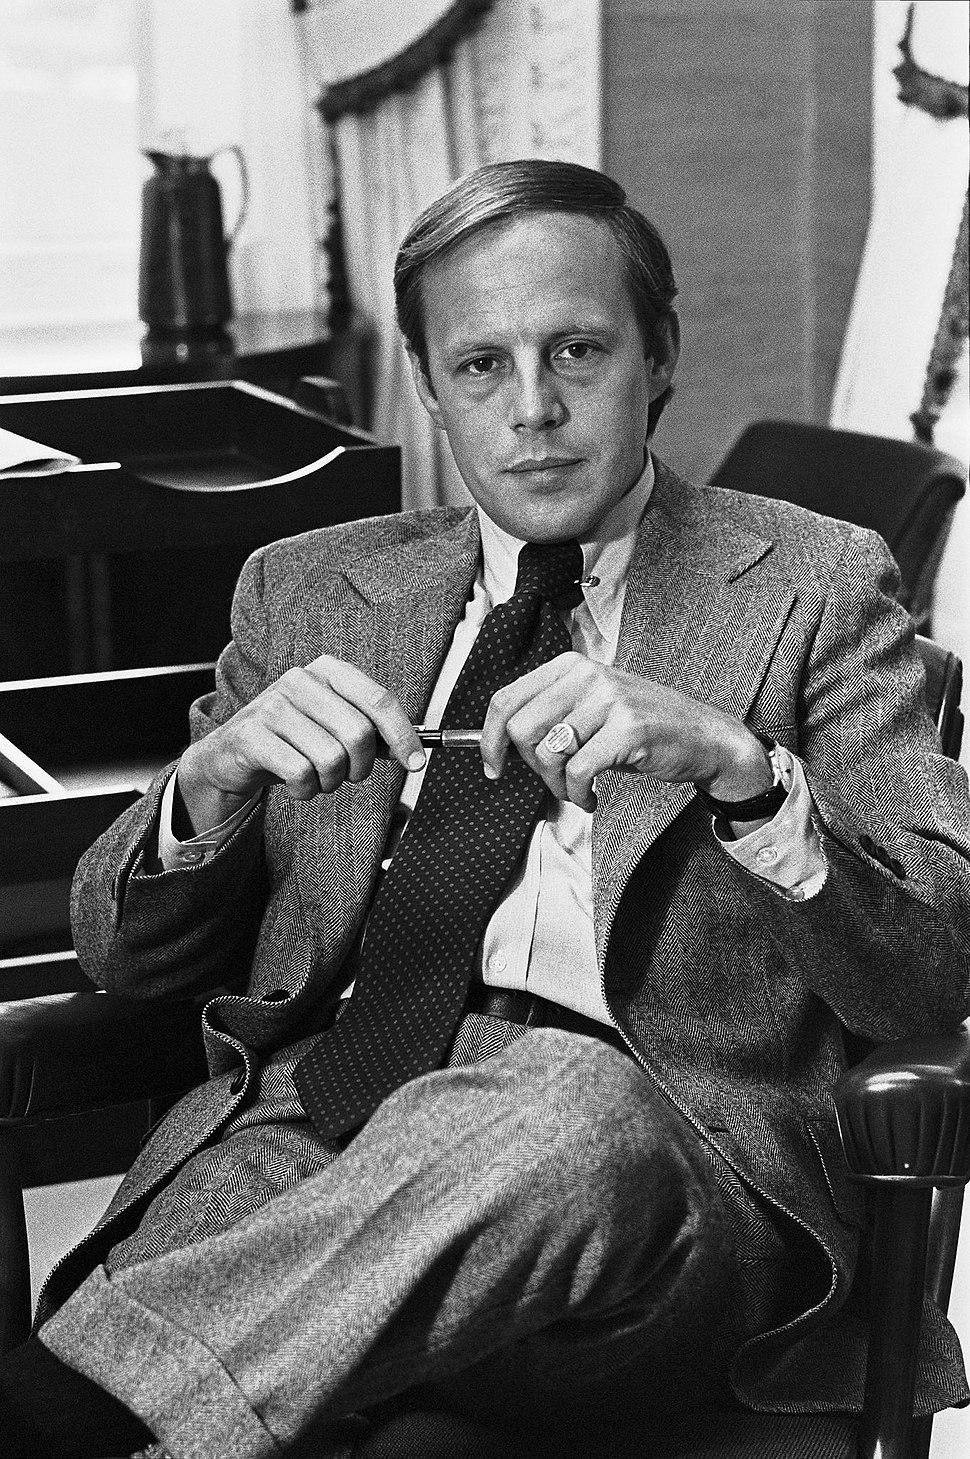 John Dean photo portrait as White House Counsel black and white sitting